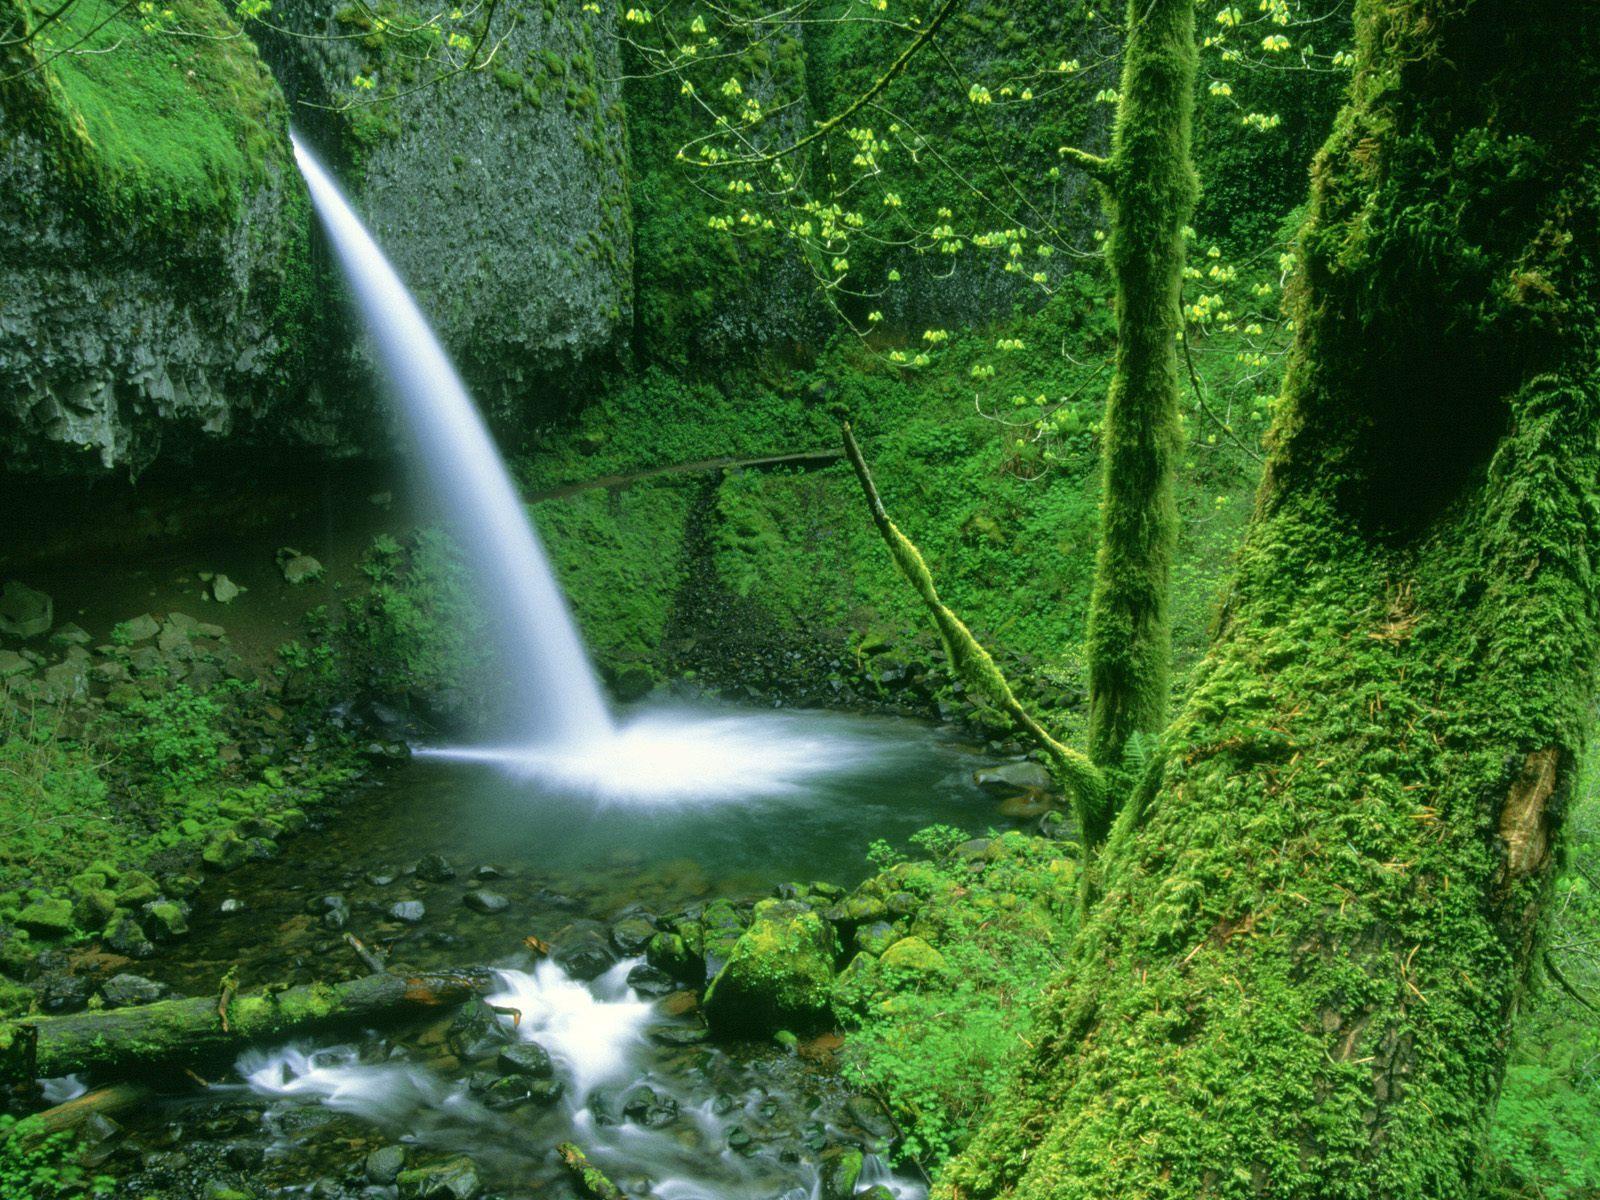 Waterfalls Wallpaper Download Wallpaper DaWallpaperz 1600x1200